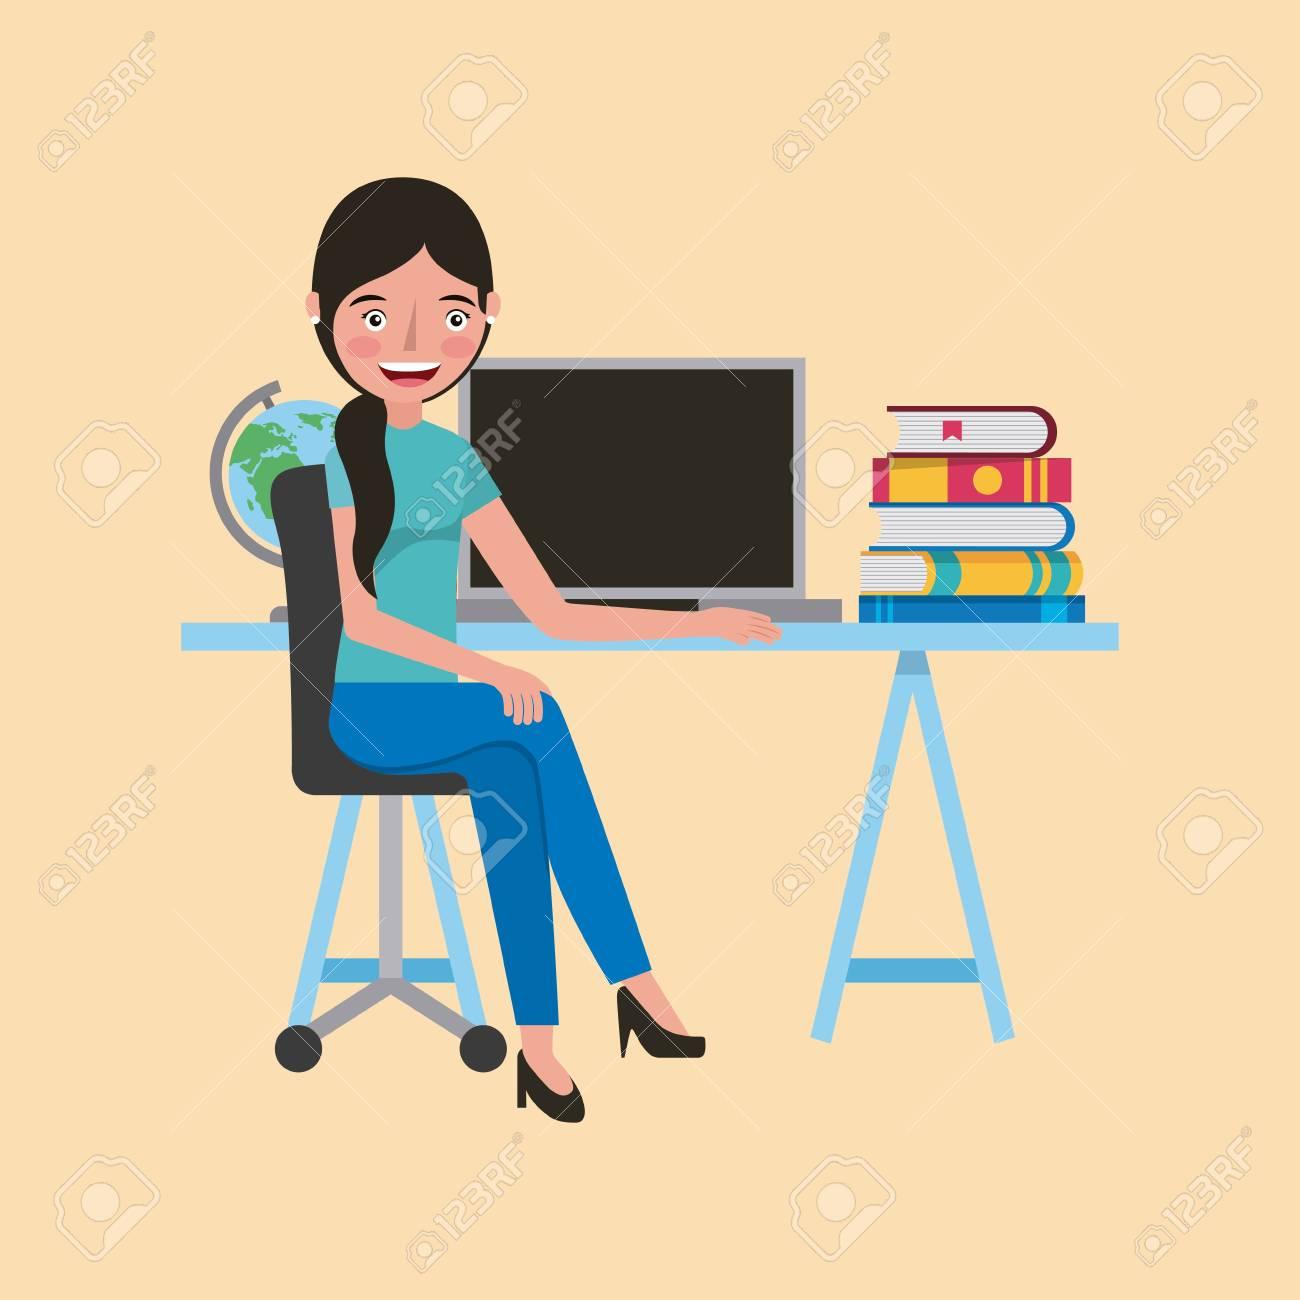 Seniors Learning Computer Illustration 12731810 - Megapixl